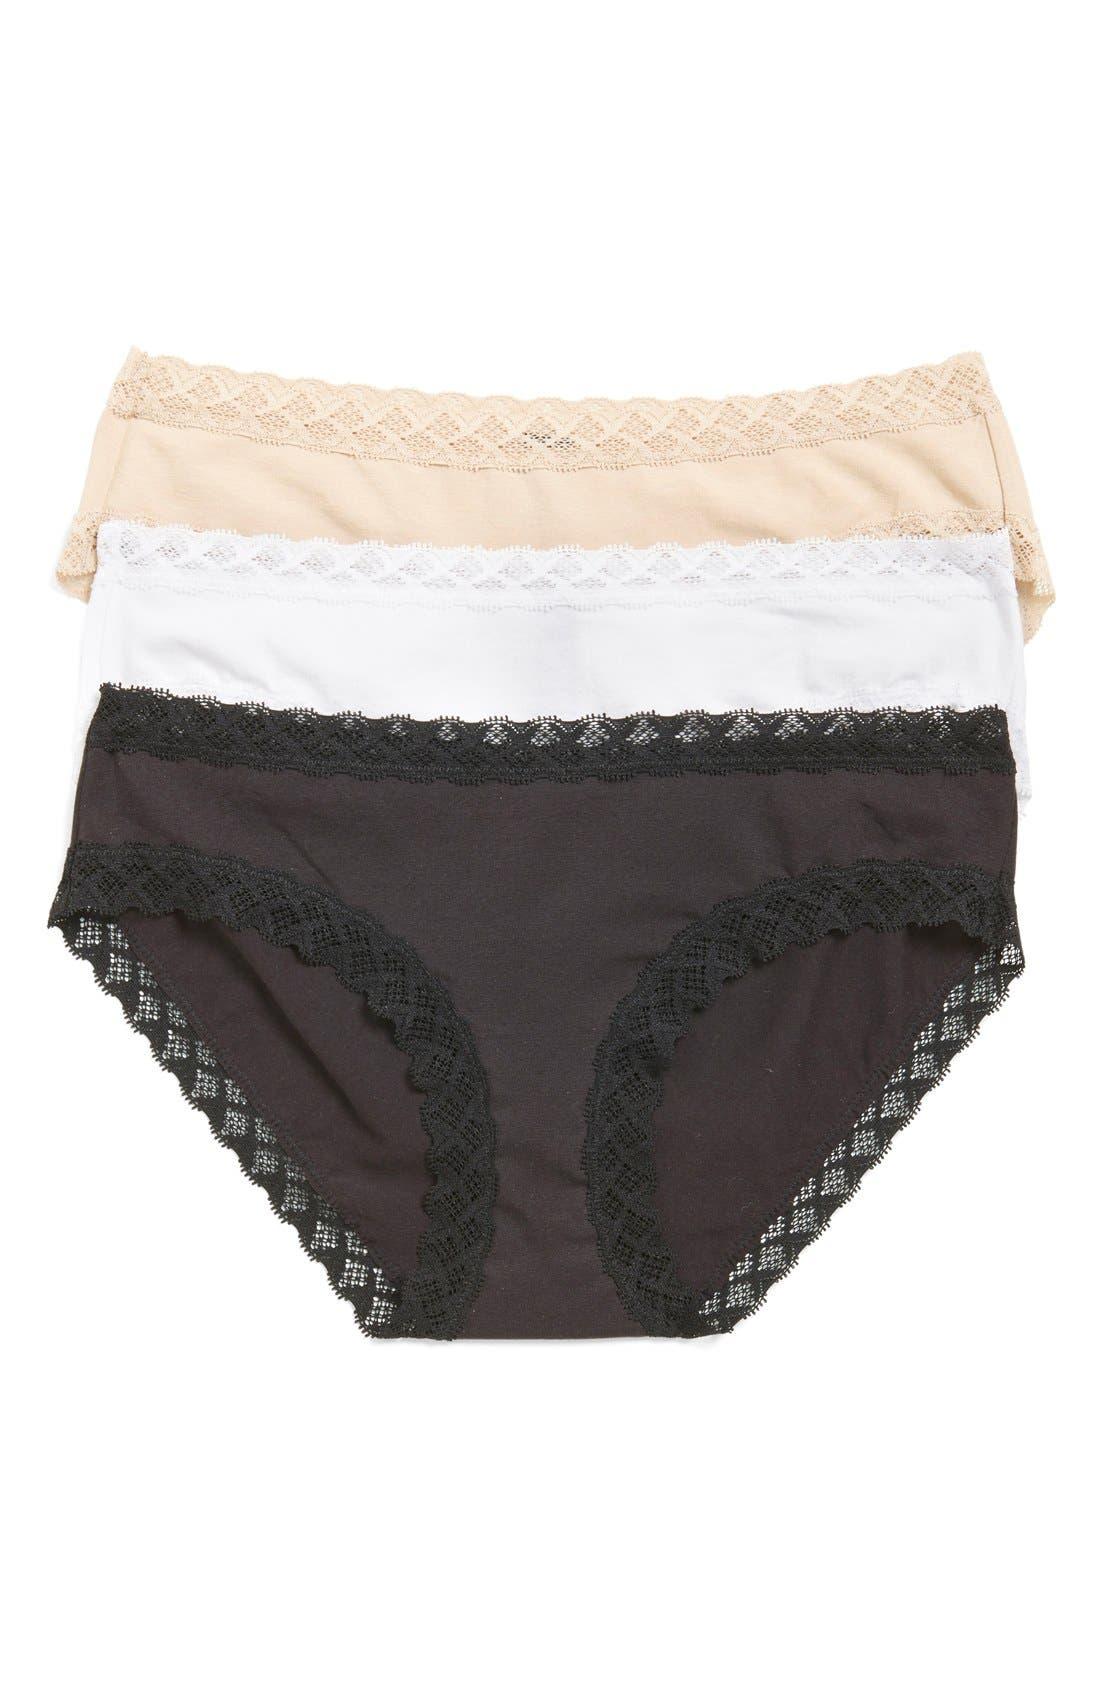 Main Image - Natori Bliss 3-Pack Cotton Briefs